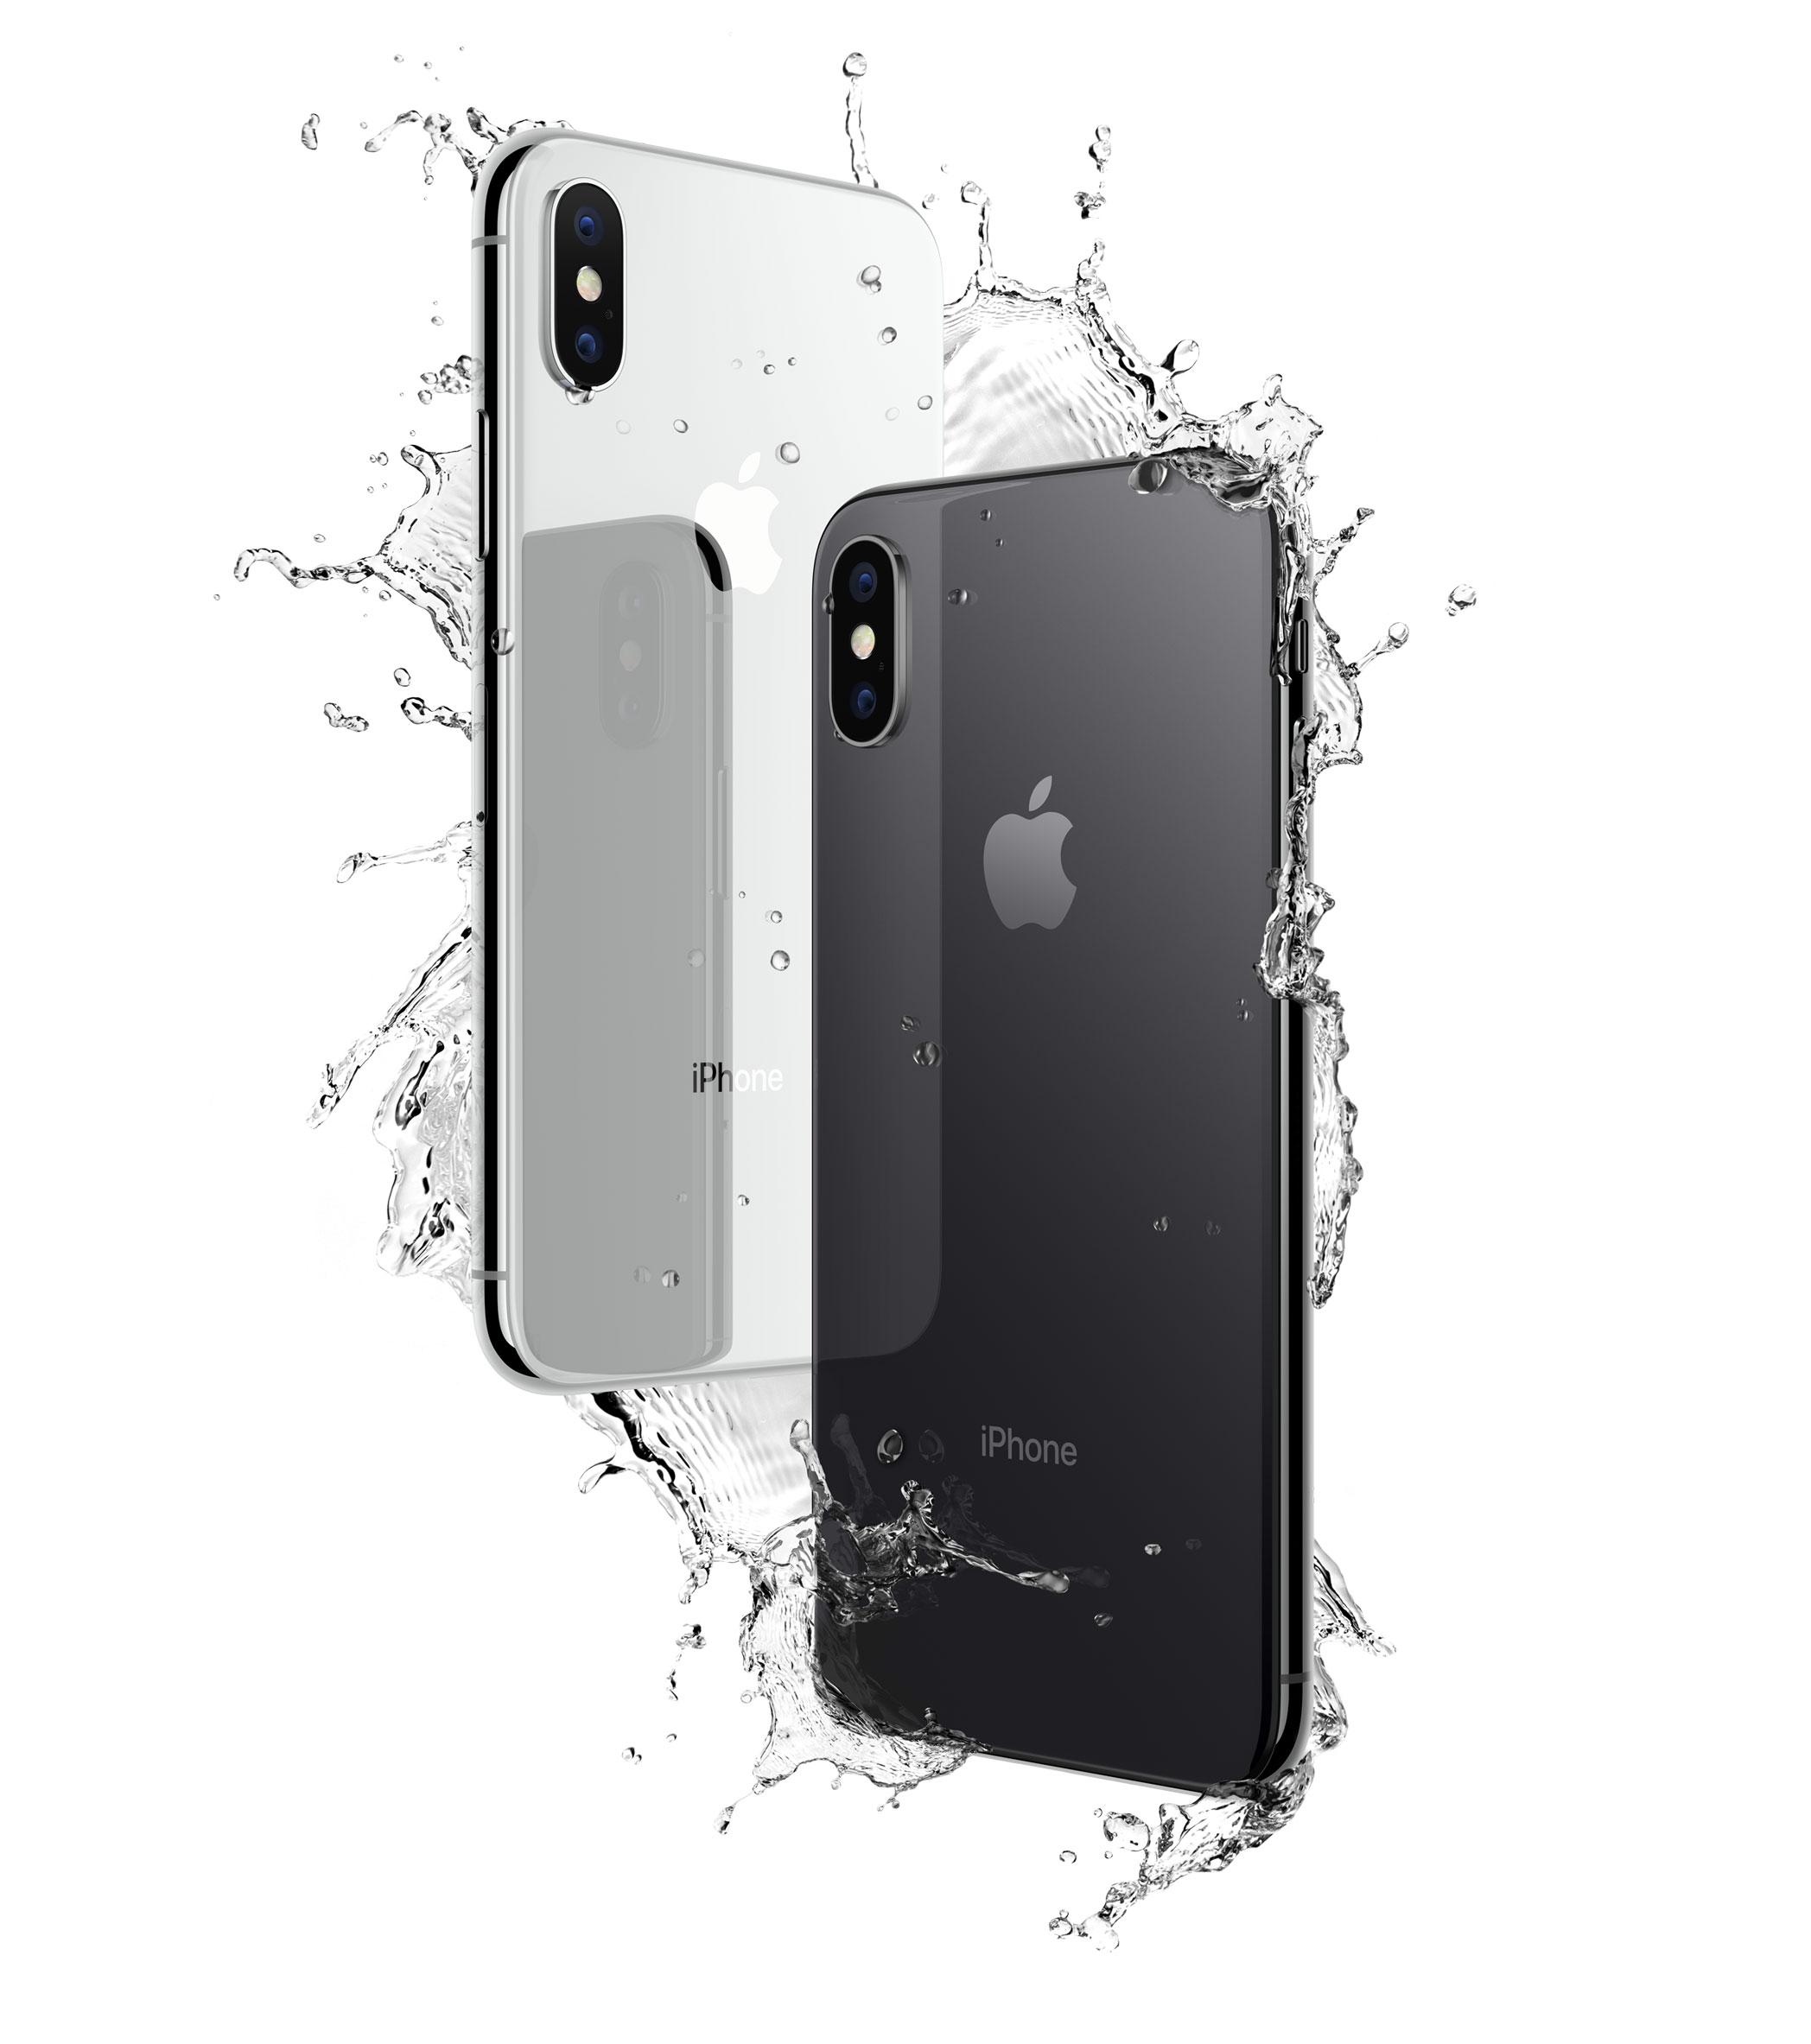 Grozi blokada produkcji iPhone'ów?